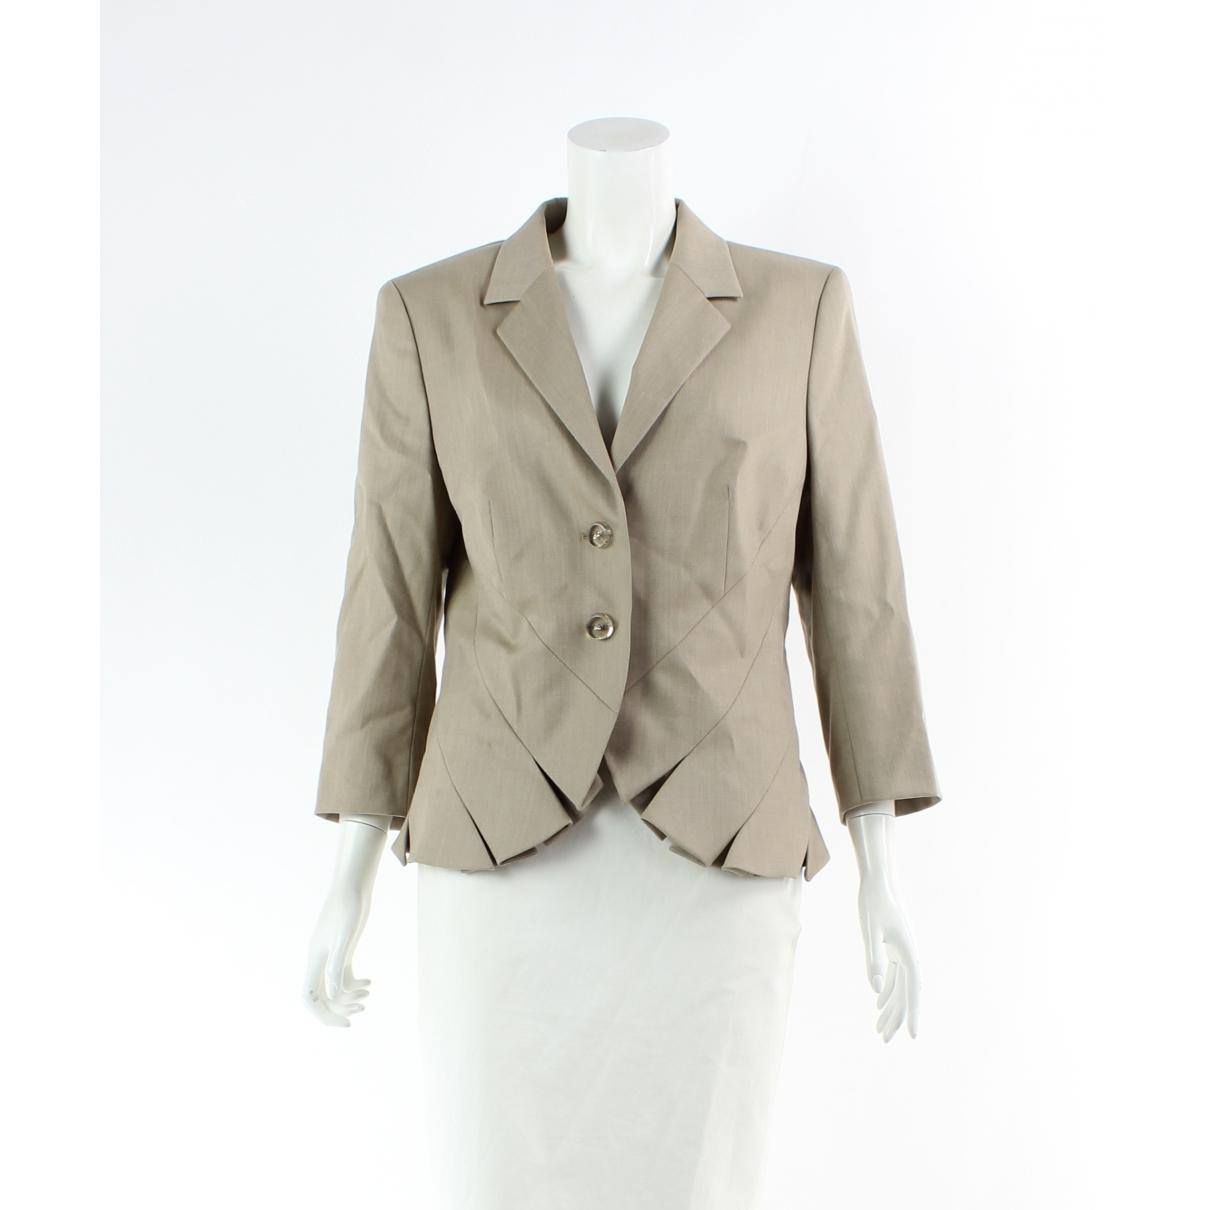 Autre Marque \N Beige Wool jacket for Women 40 FR